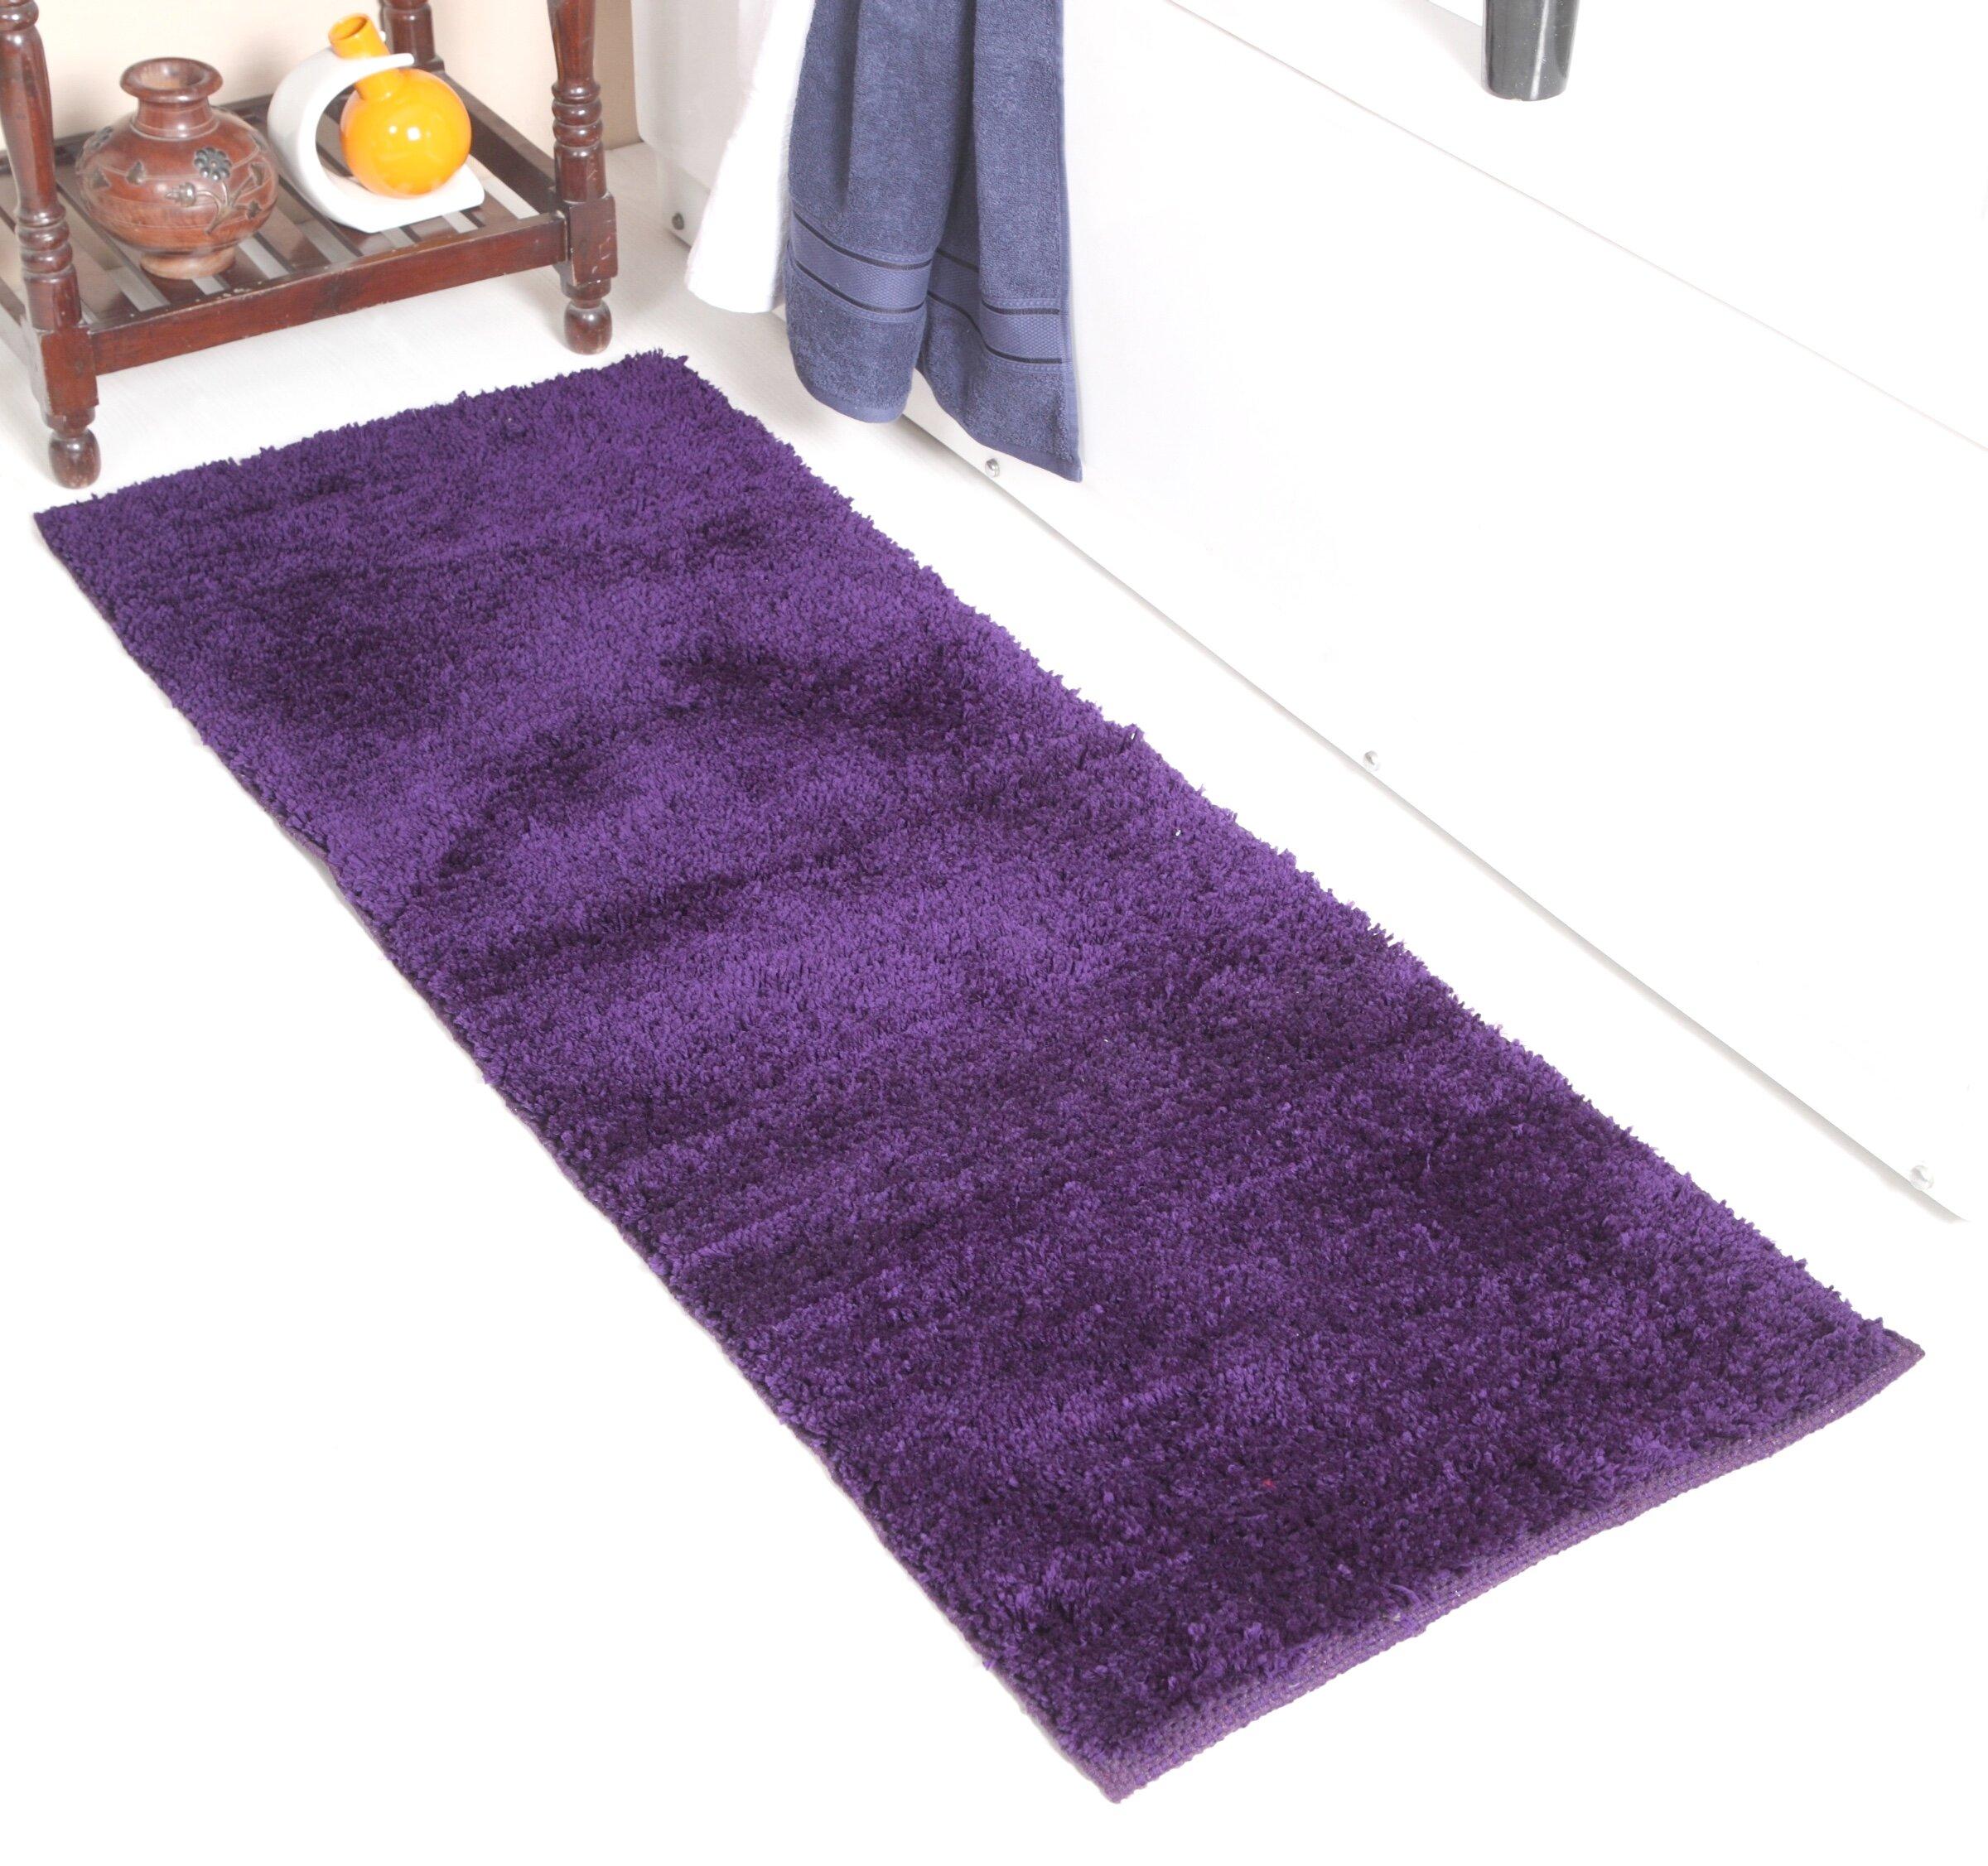 Purple Bath Rugs Mats You Ll Love In 2021 Wayfair Ca